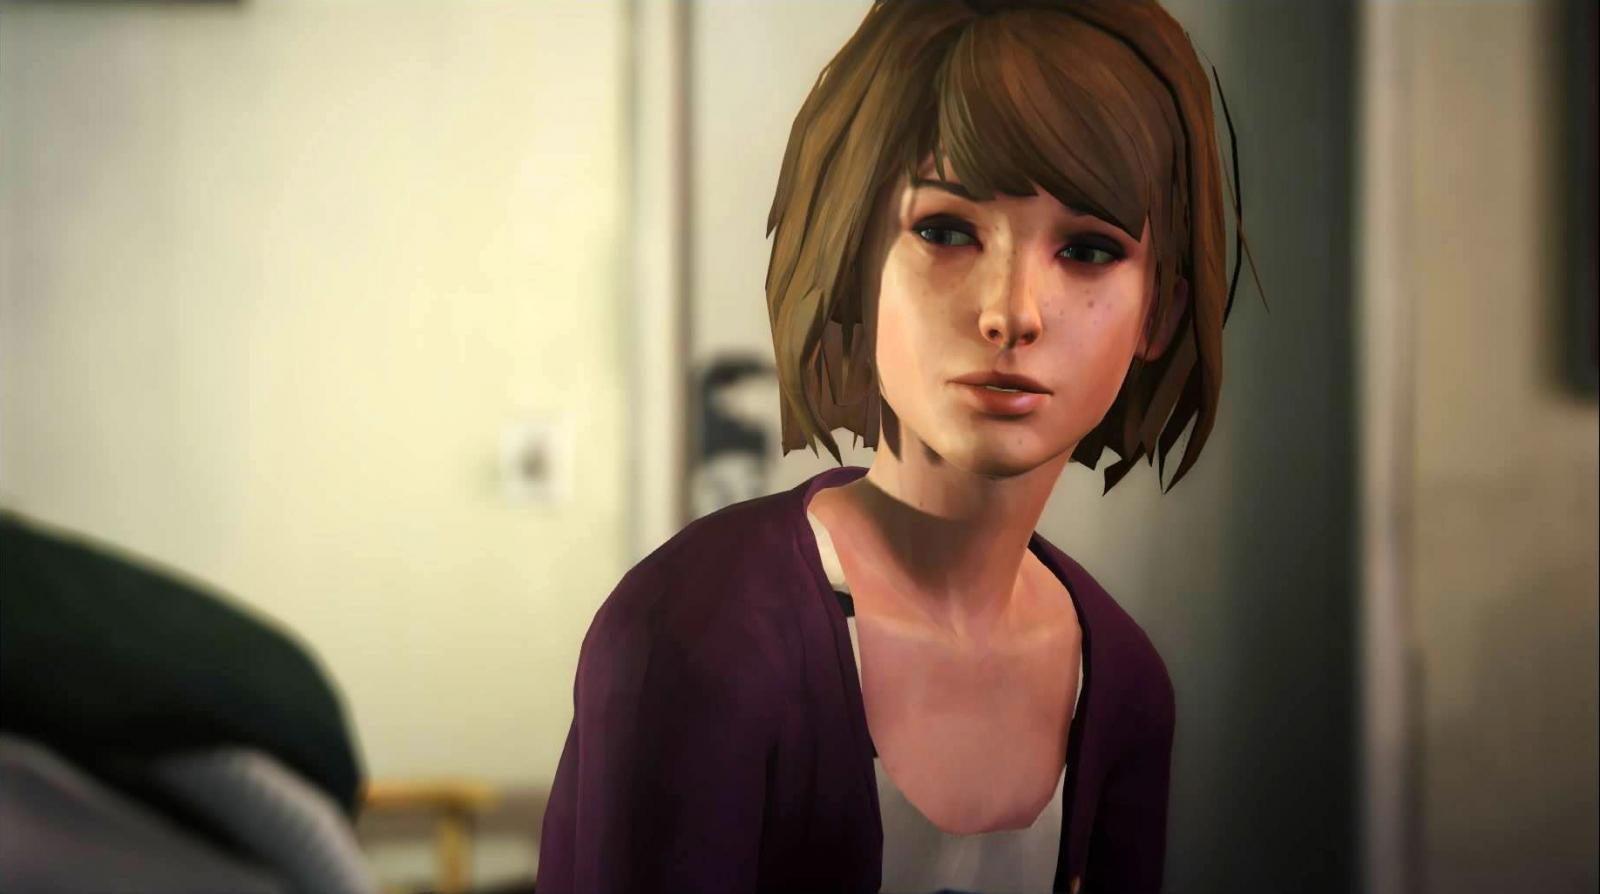 Макс Колфилд в четвёртом эпизоде игры Life is Strange